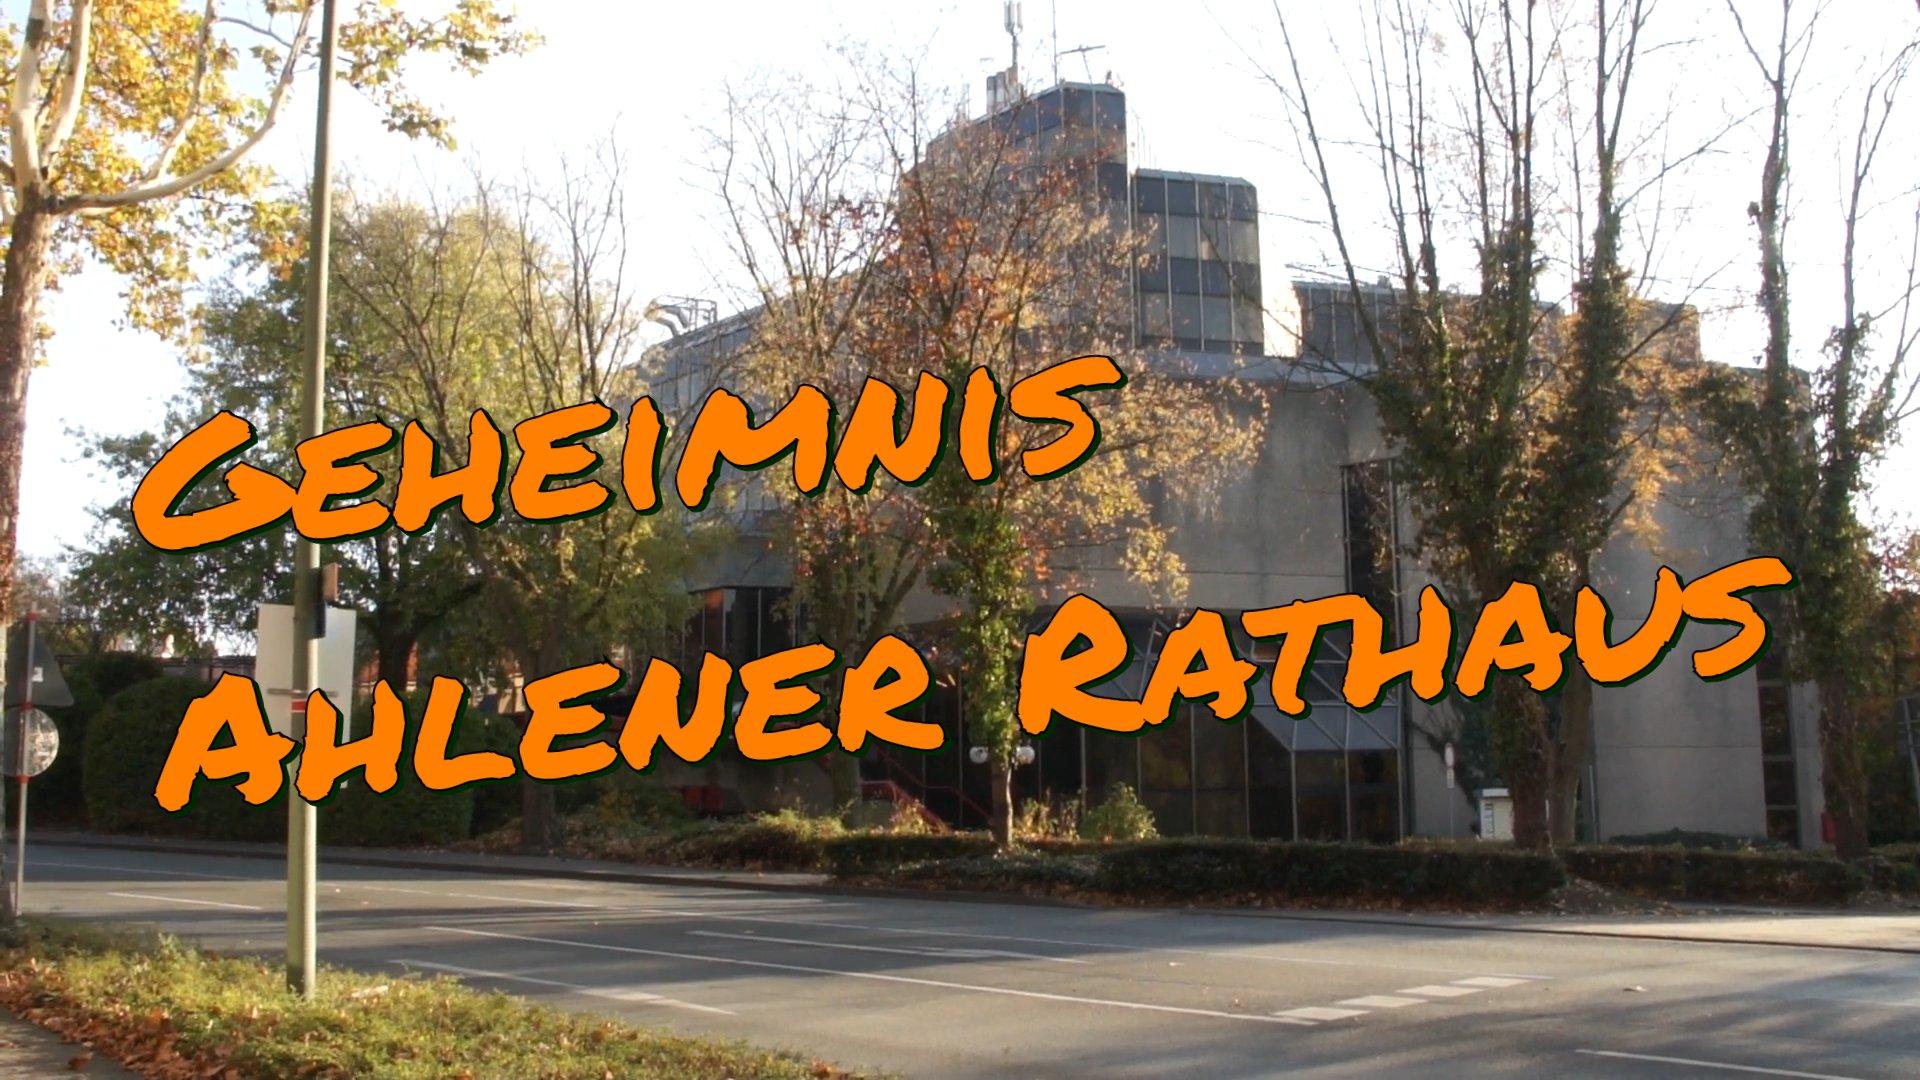 Geheimnis Ahlener Rathaus